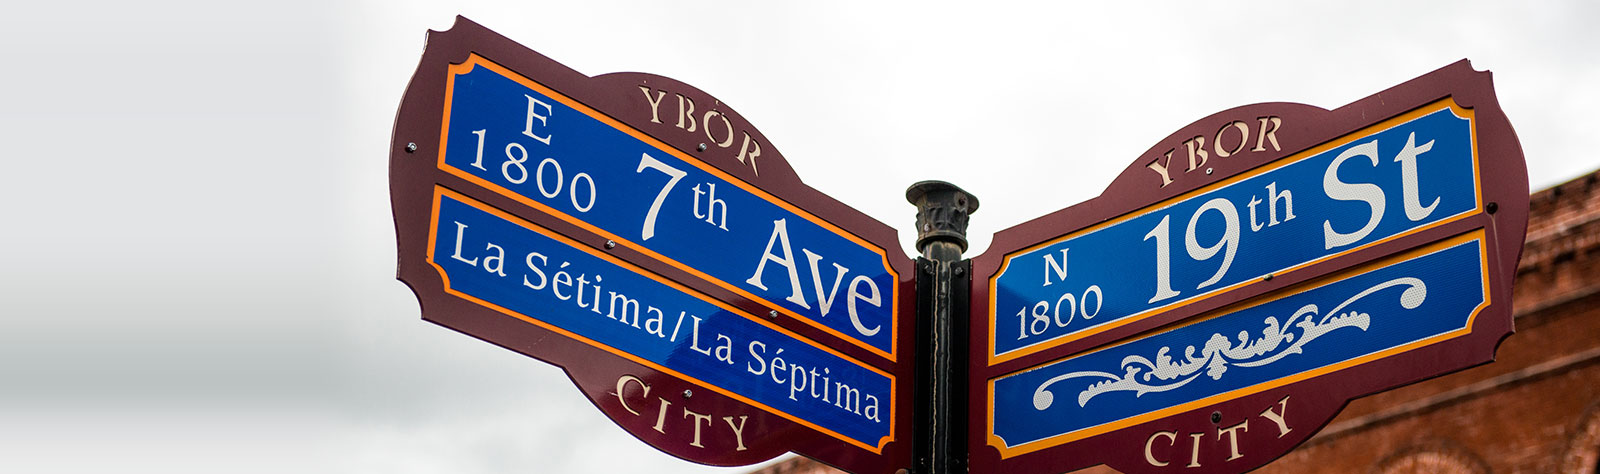 Ybor City, Florida